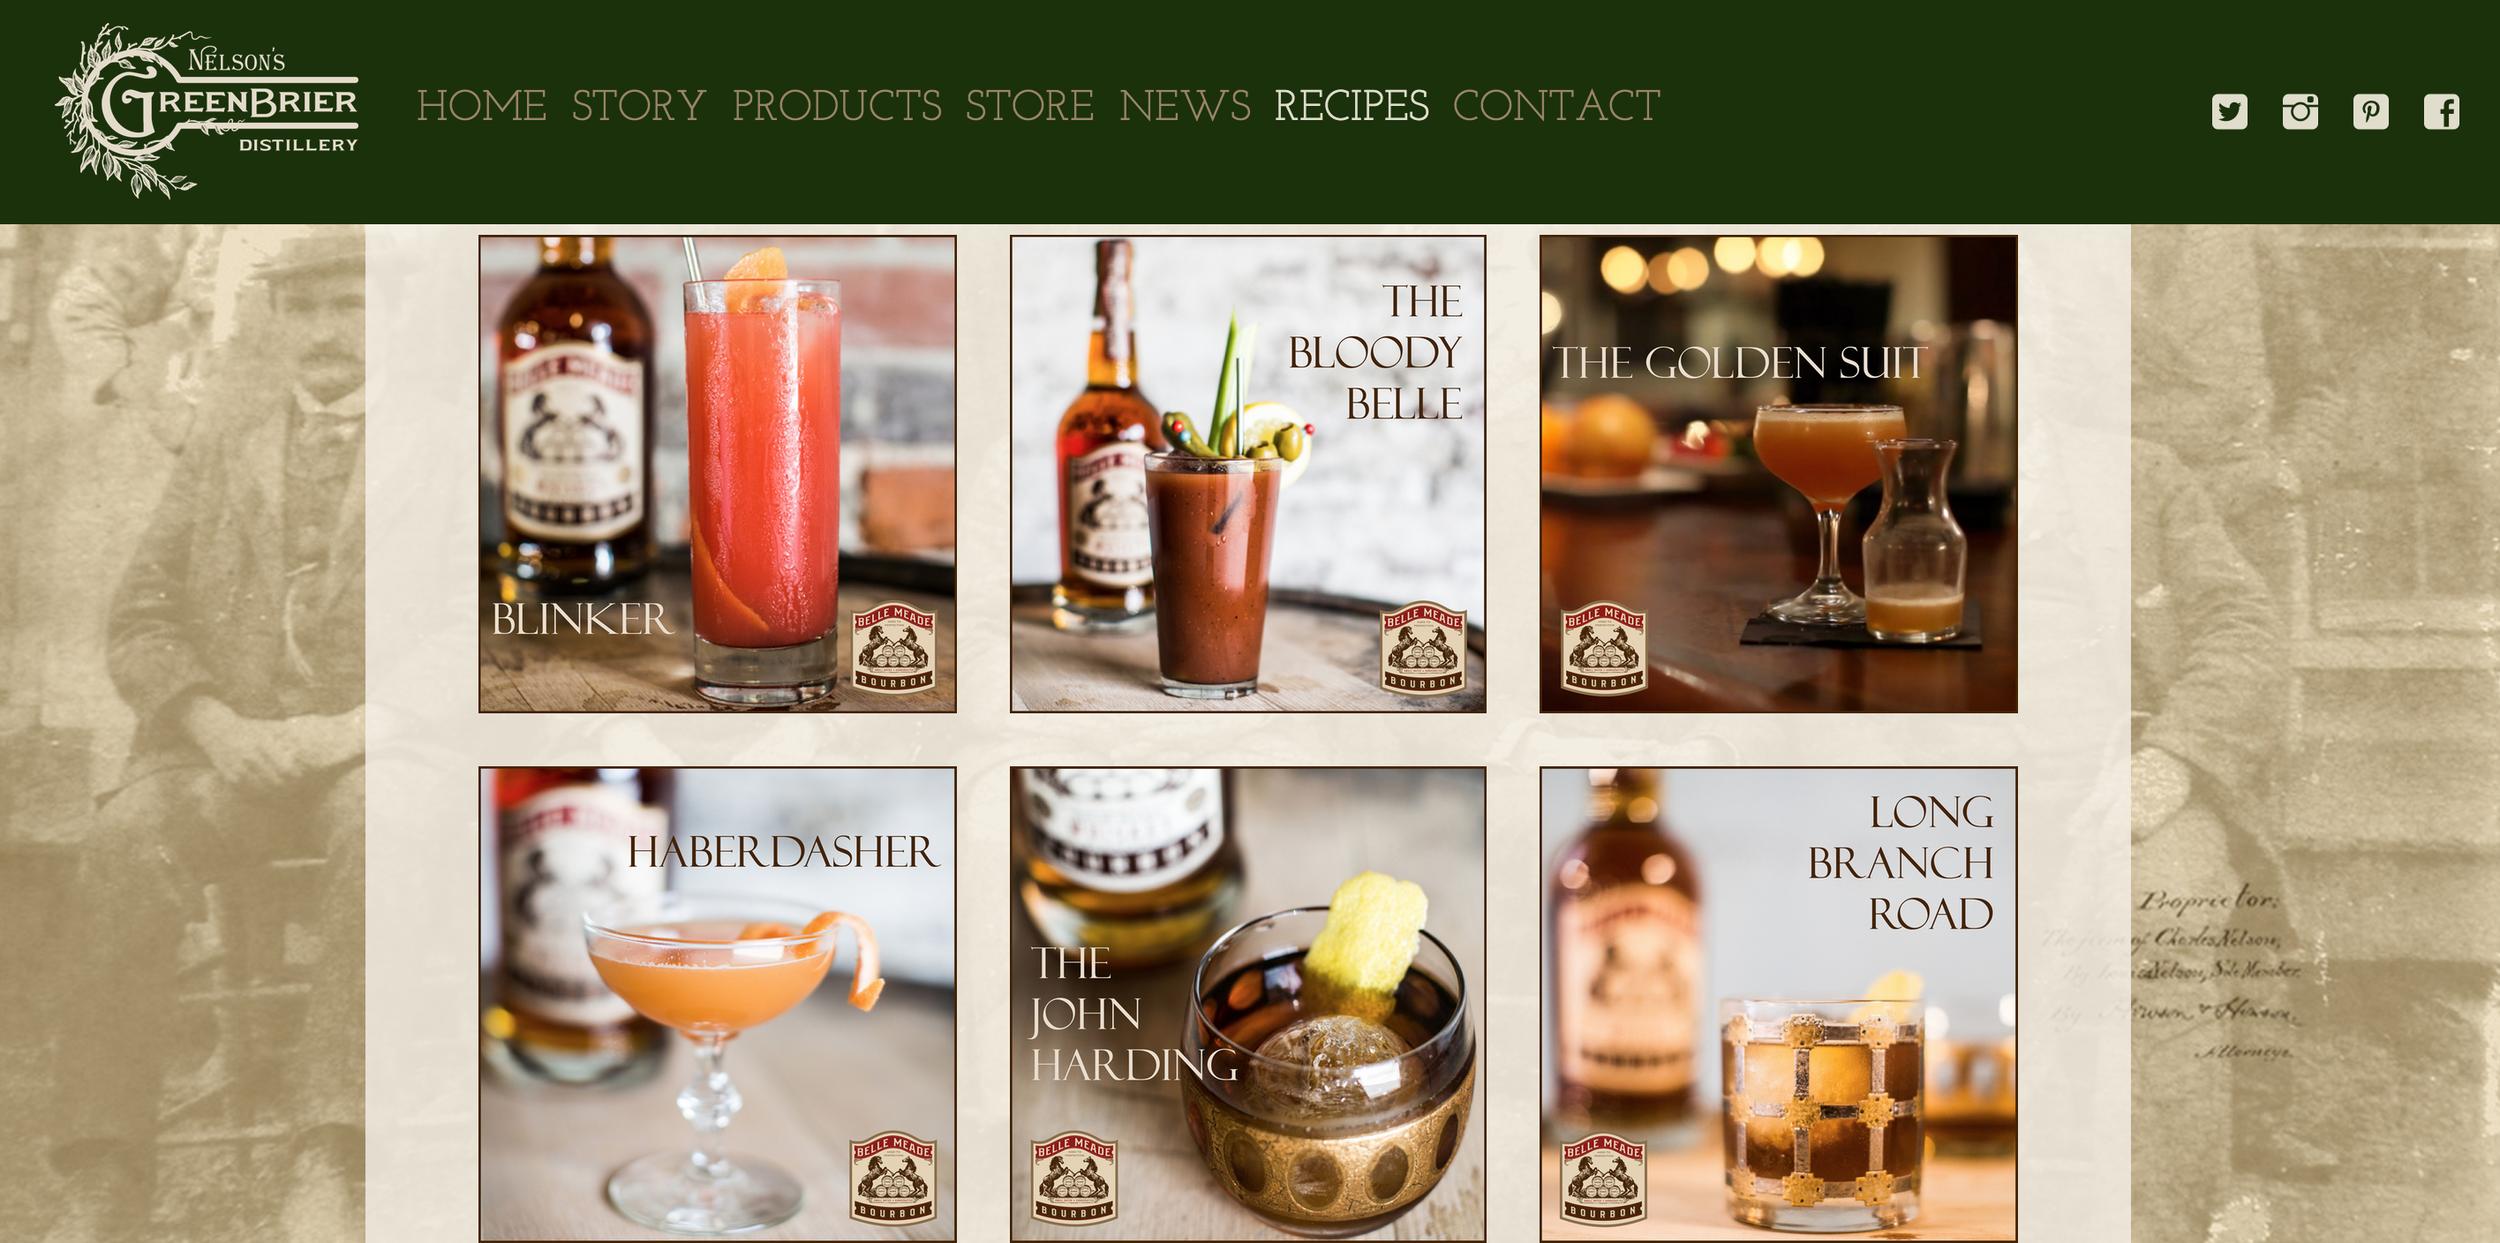 Website design for Nelson's Green Brier Distillery